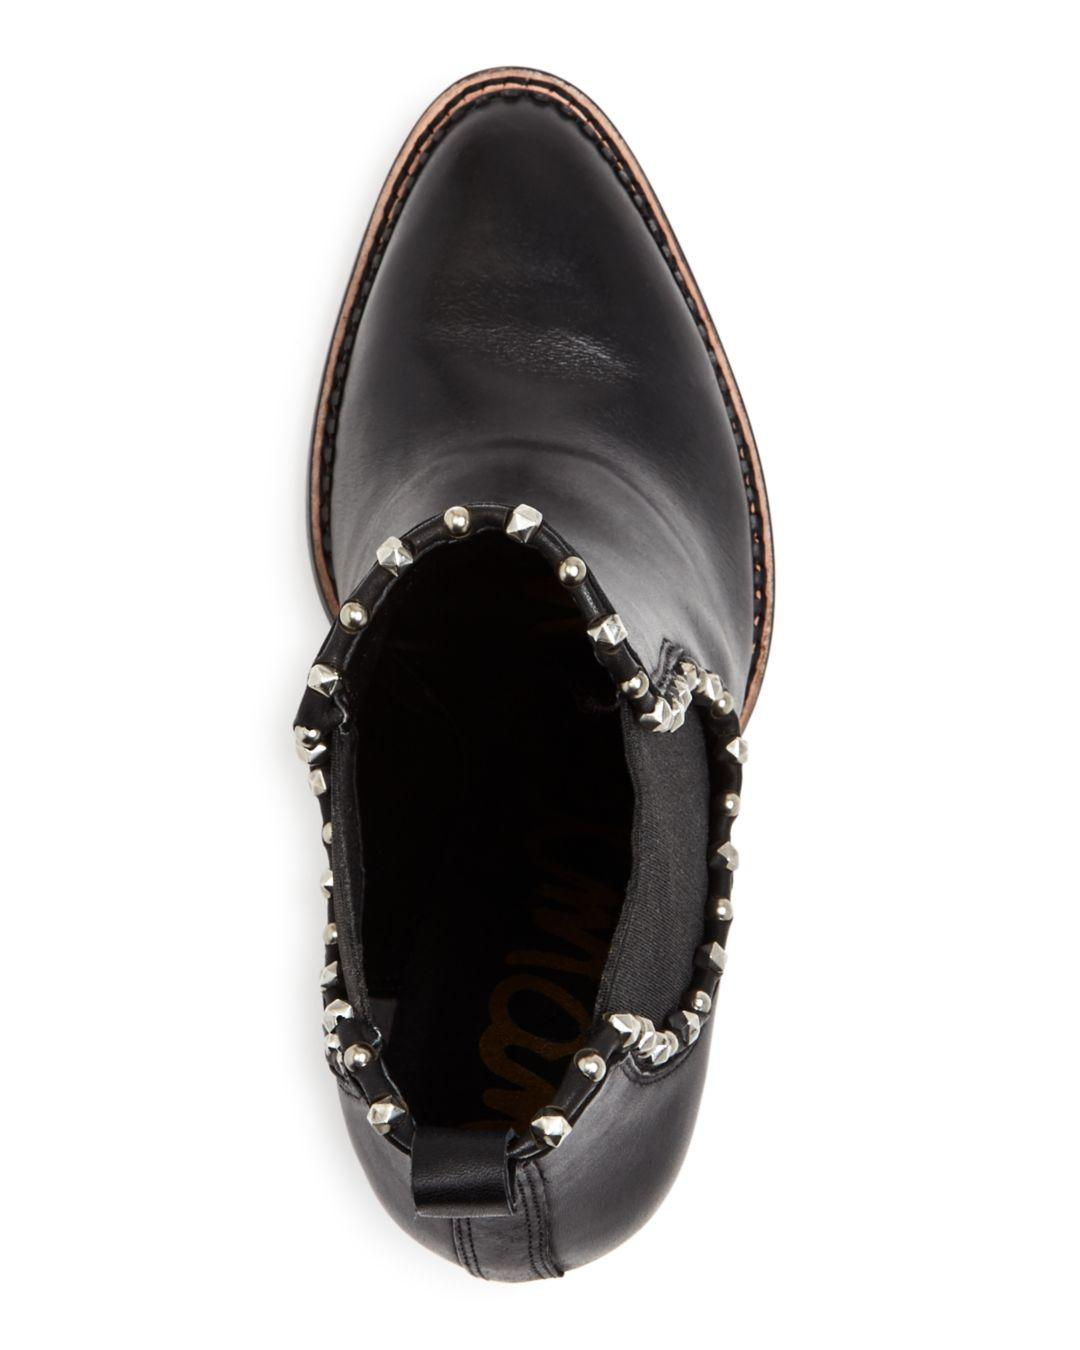 6d2fbd30842 Sam Edelman Women's Salma Studded High Block-heel Booties in Black ...